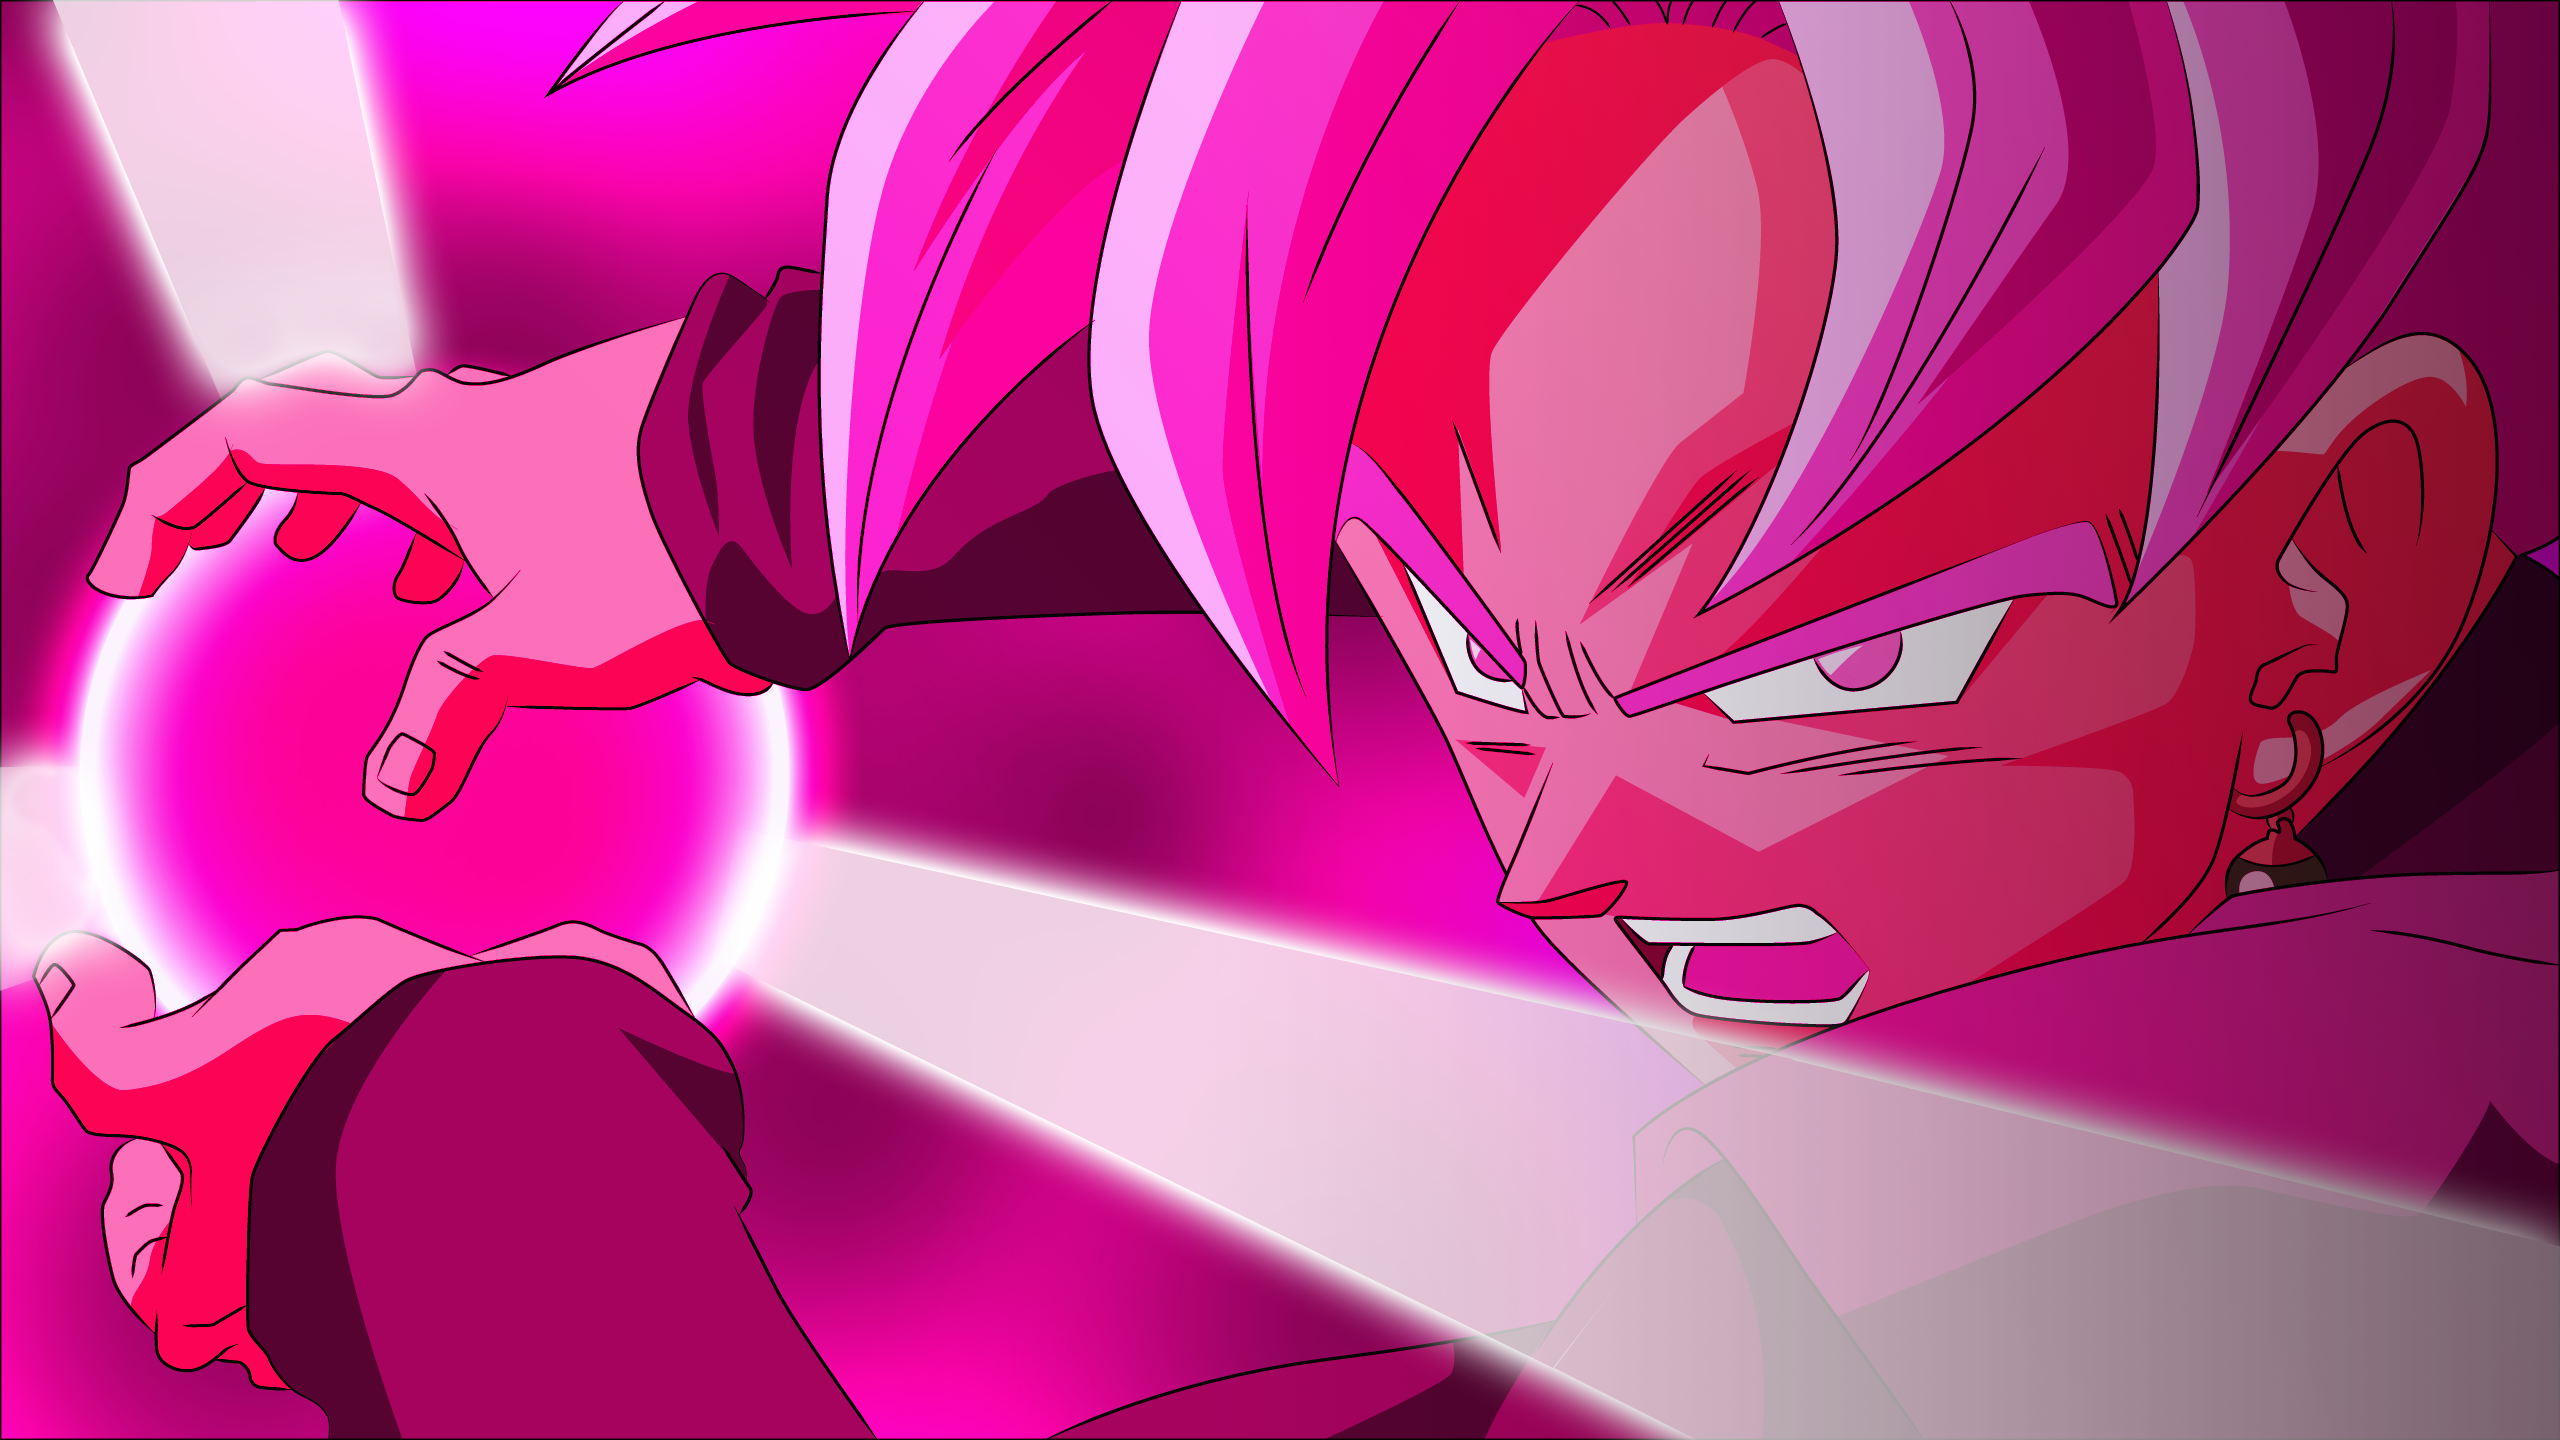 Anime 2560x1440 Dragon Ball Super Black Goku SSJ Rosé Super Saiyajin Rosé Super Saiyan Rosé Dragon Ball pink